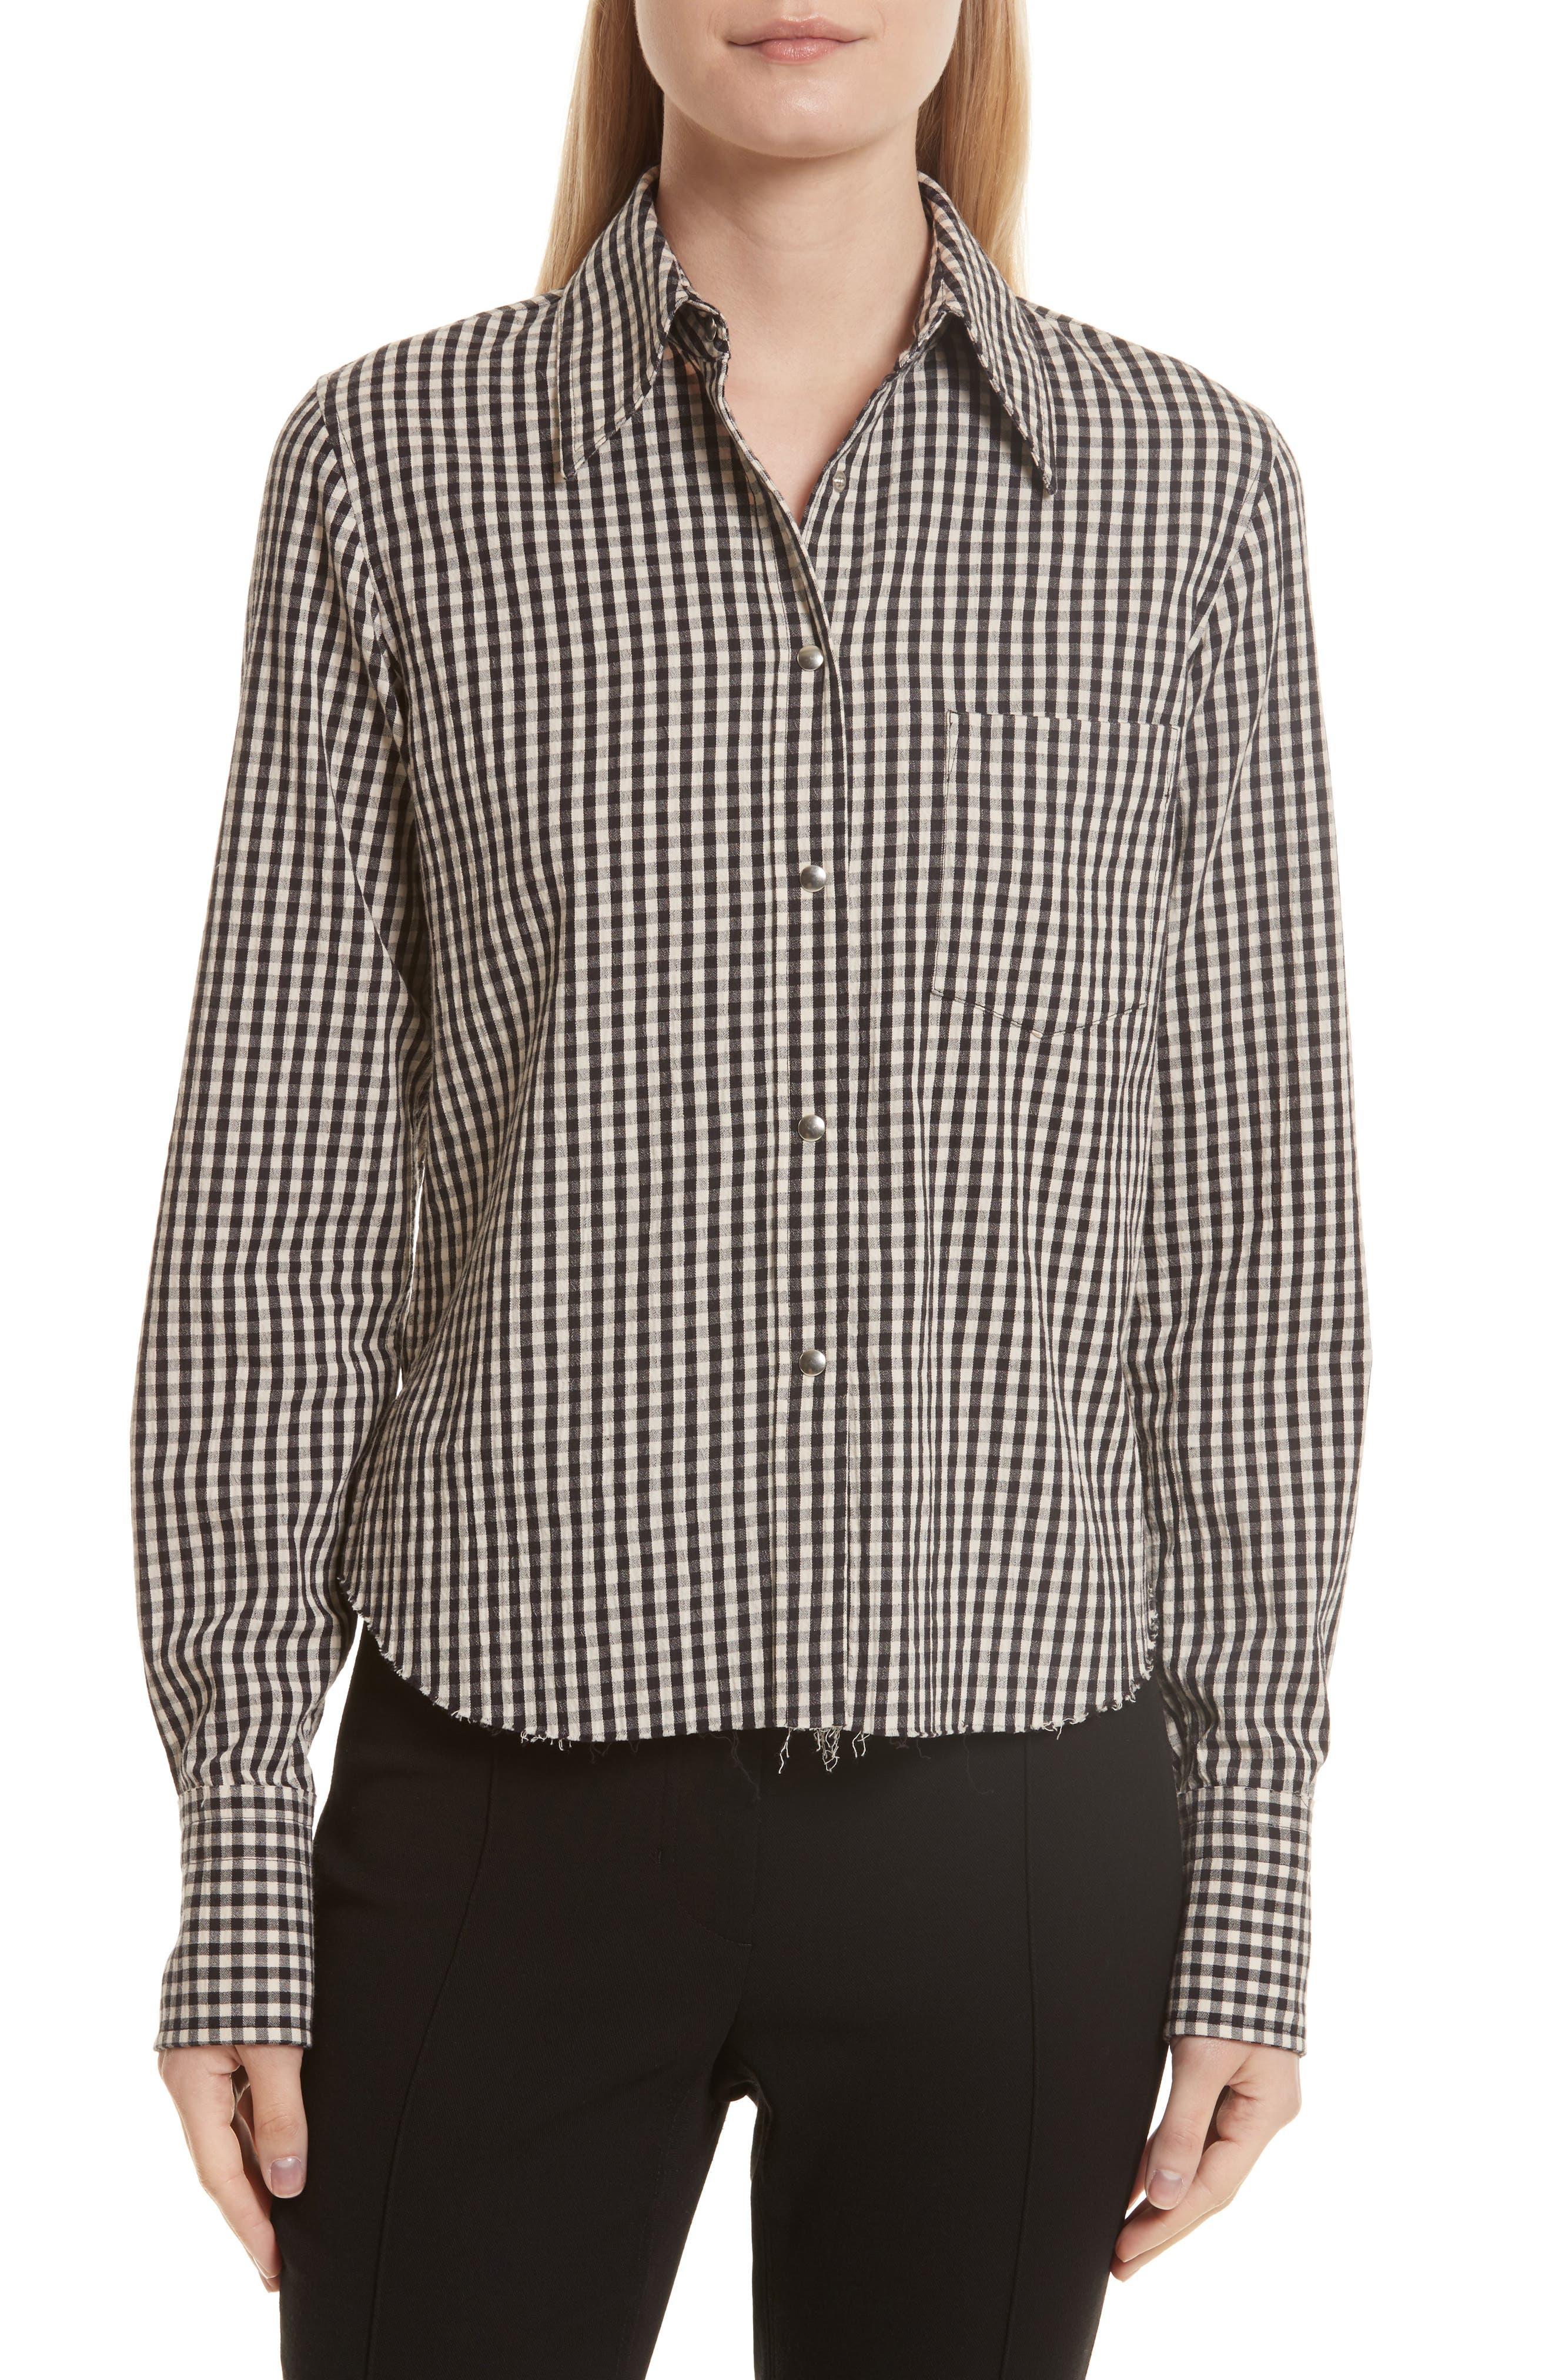 Helmut Lang Gingham Check Shirt